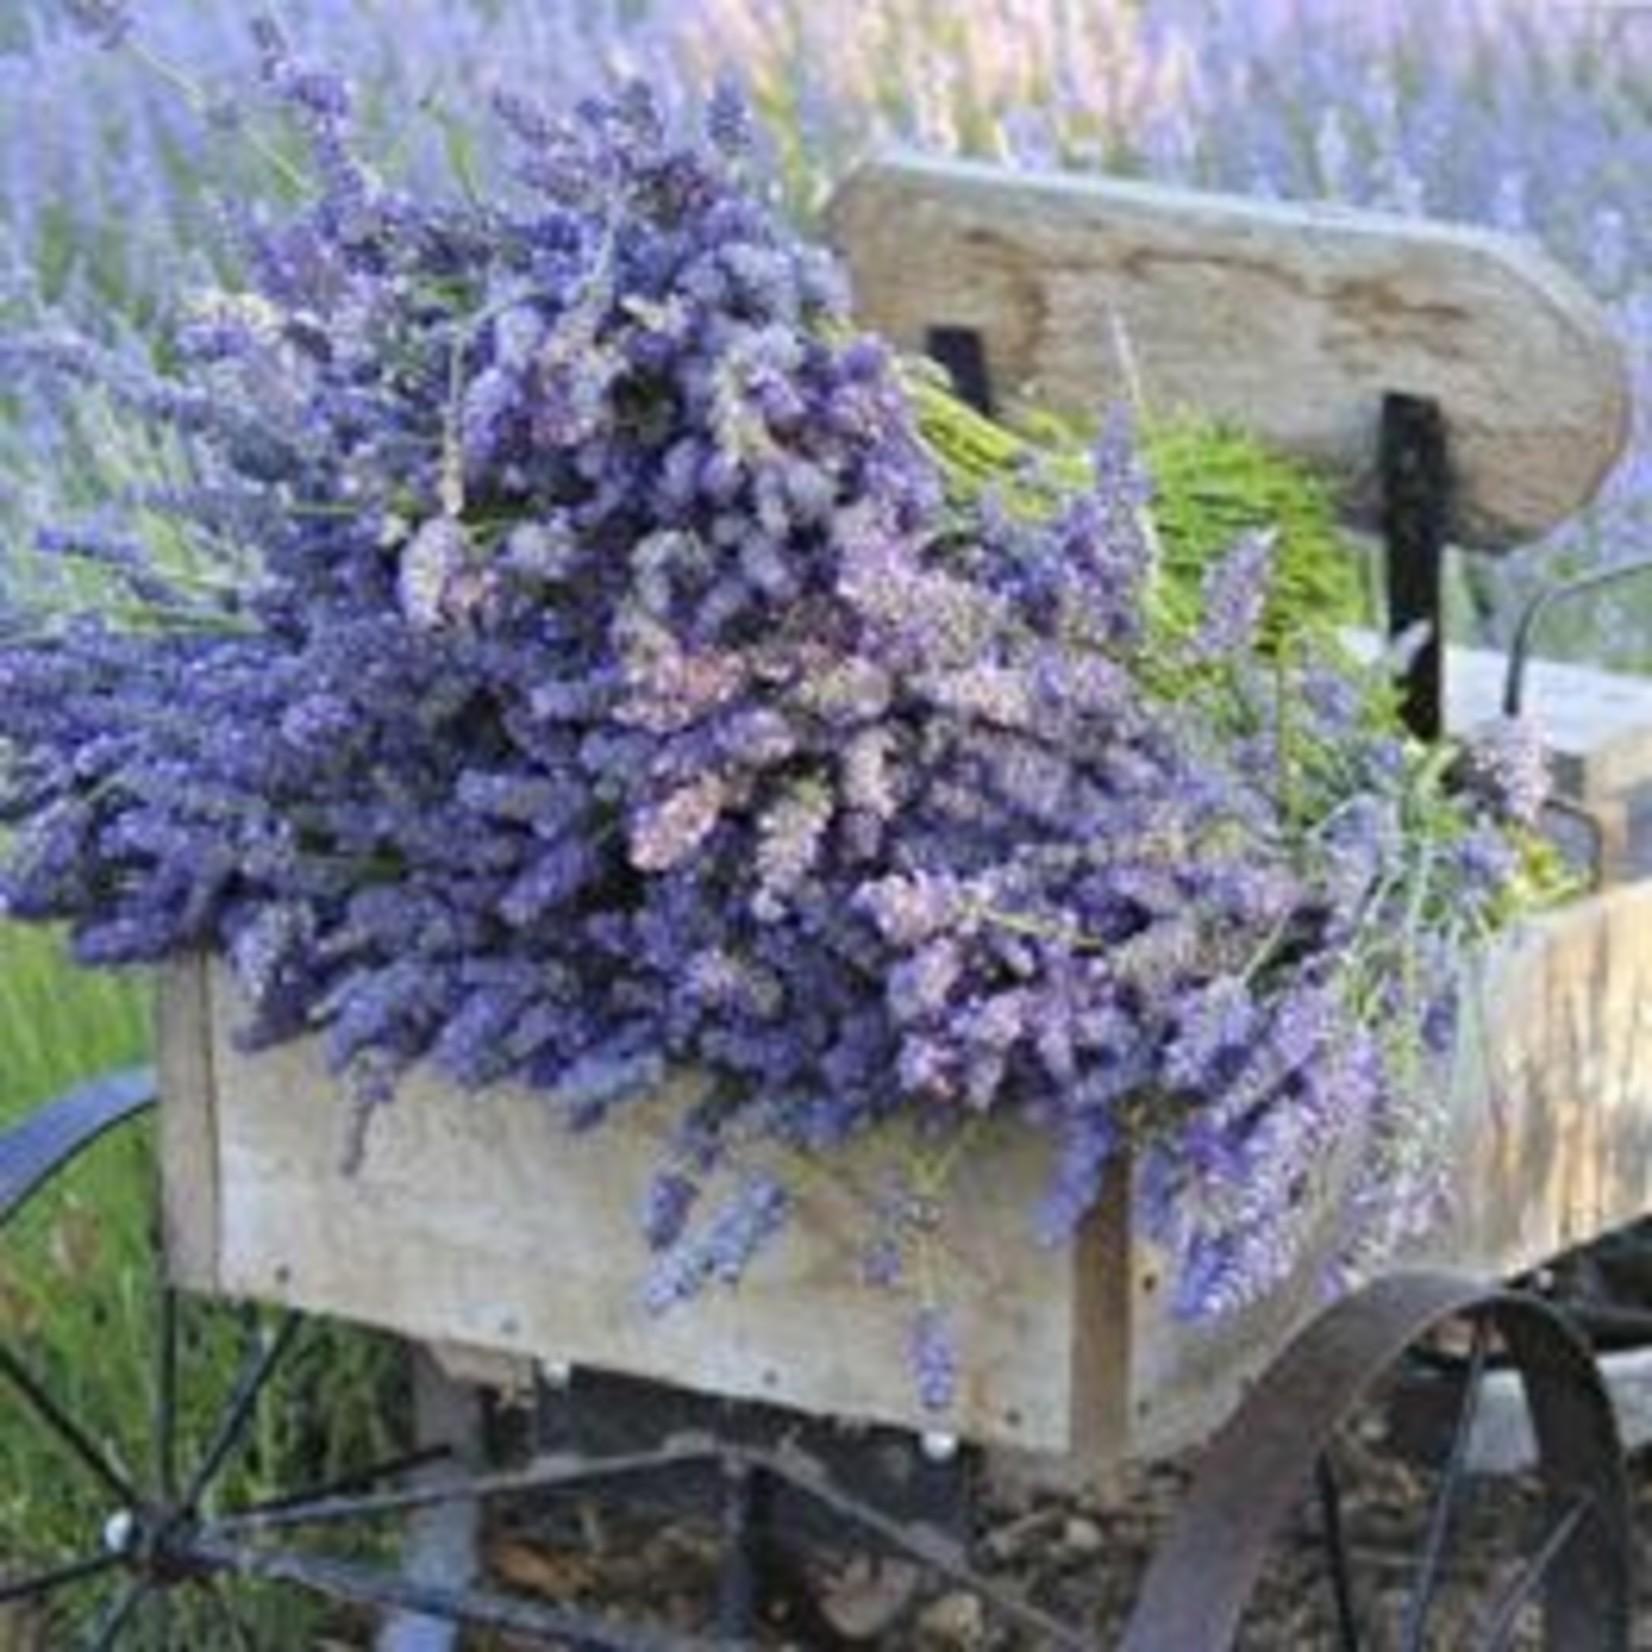 Sonoma Lavender Hand Creme in A Jar